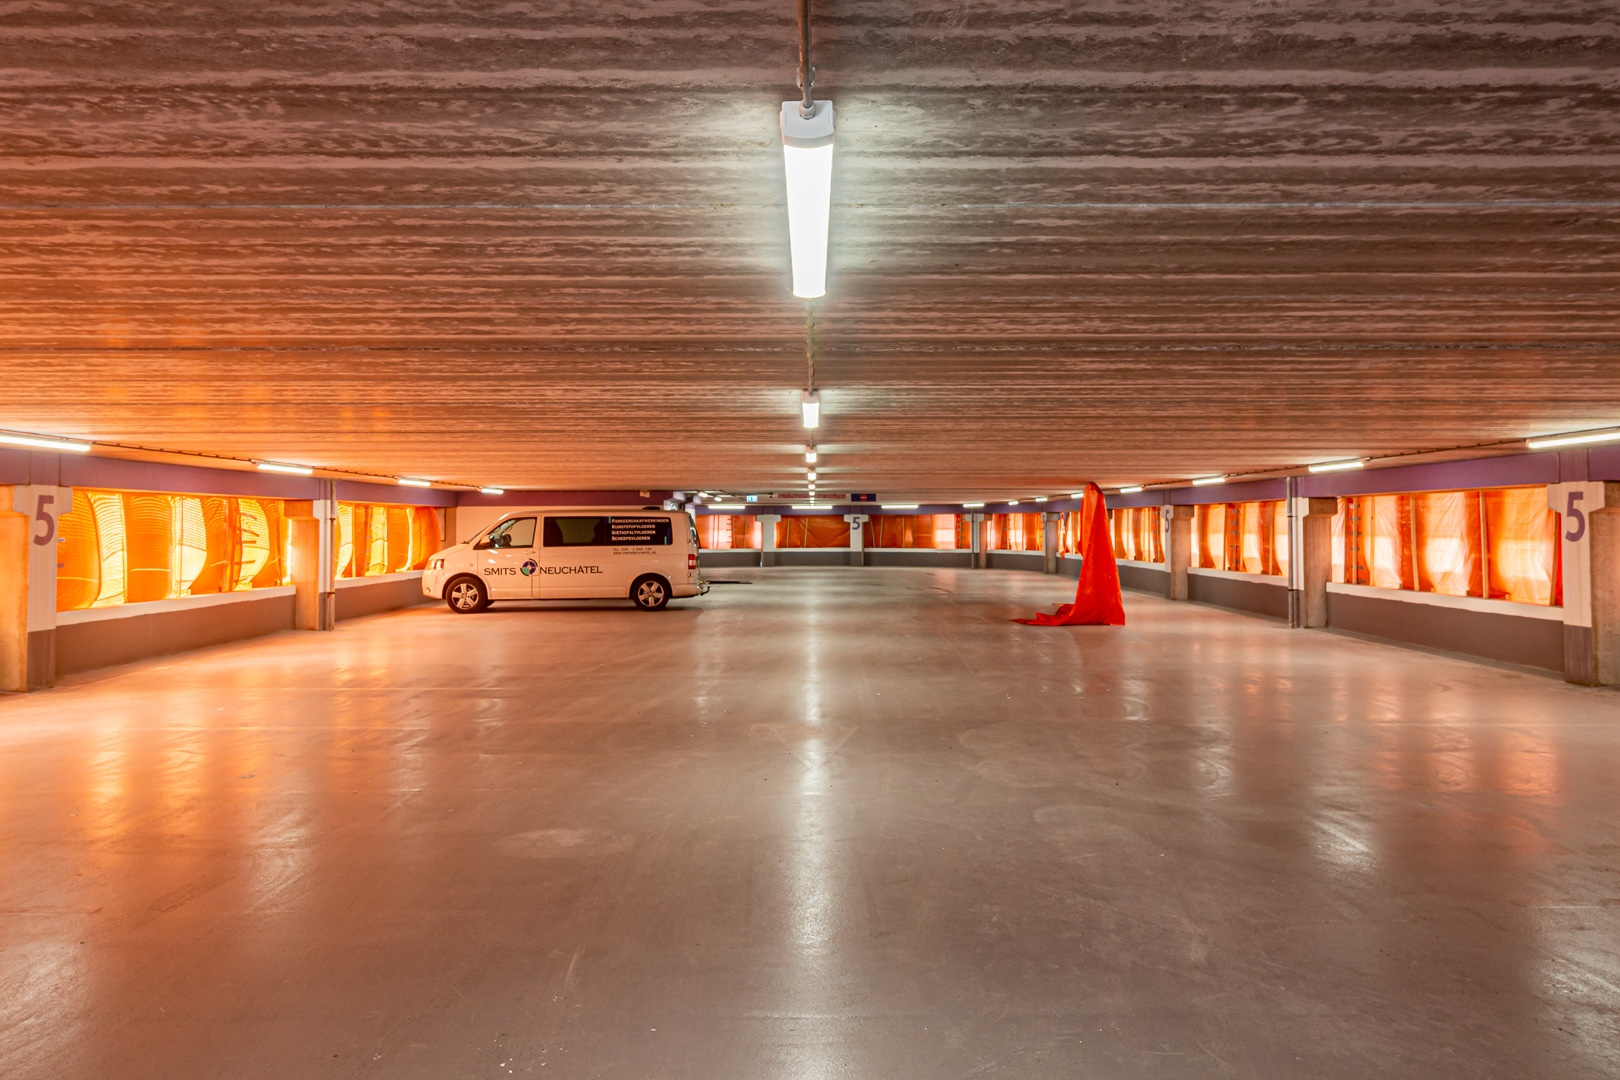 Lednovate Parkeergarage De Cope Utrecht 3 - Parkeergarage De Cope